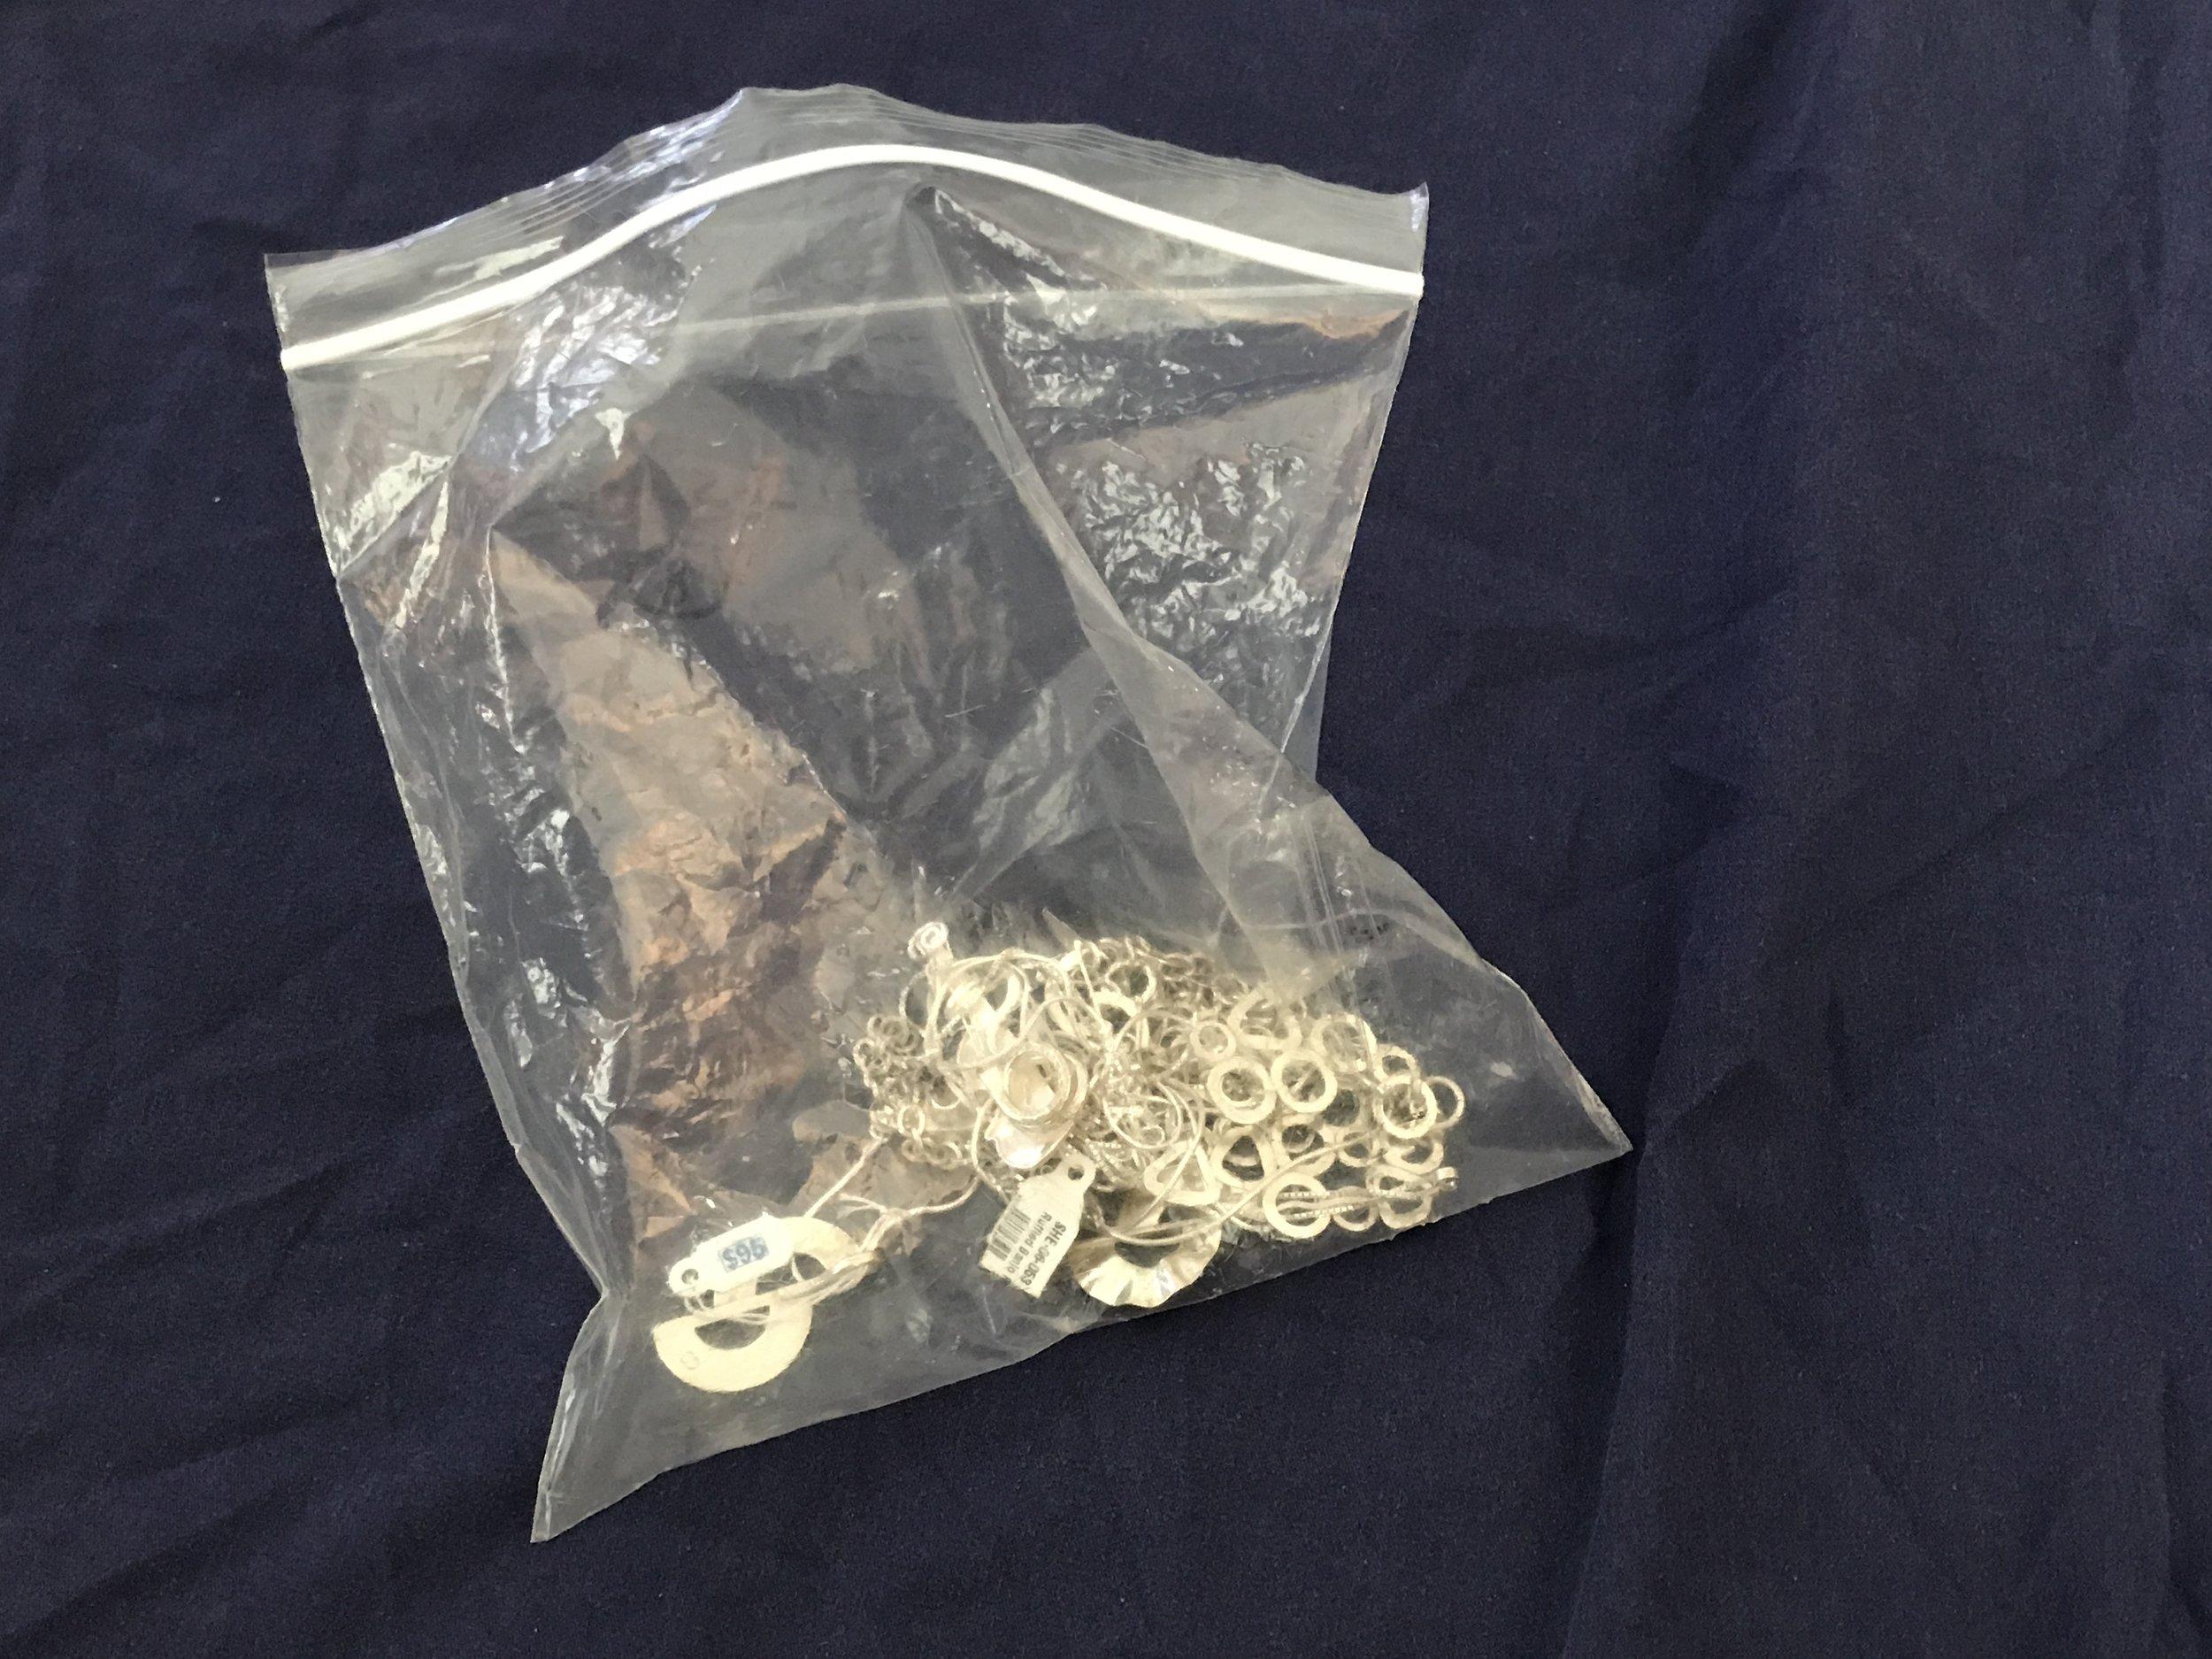 Plastic Zipper Bag for Storing Jewelry